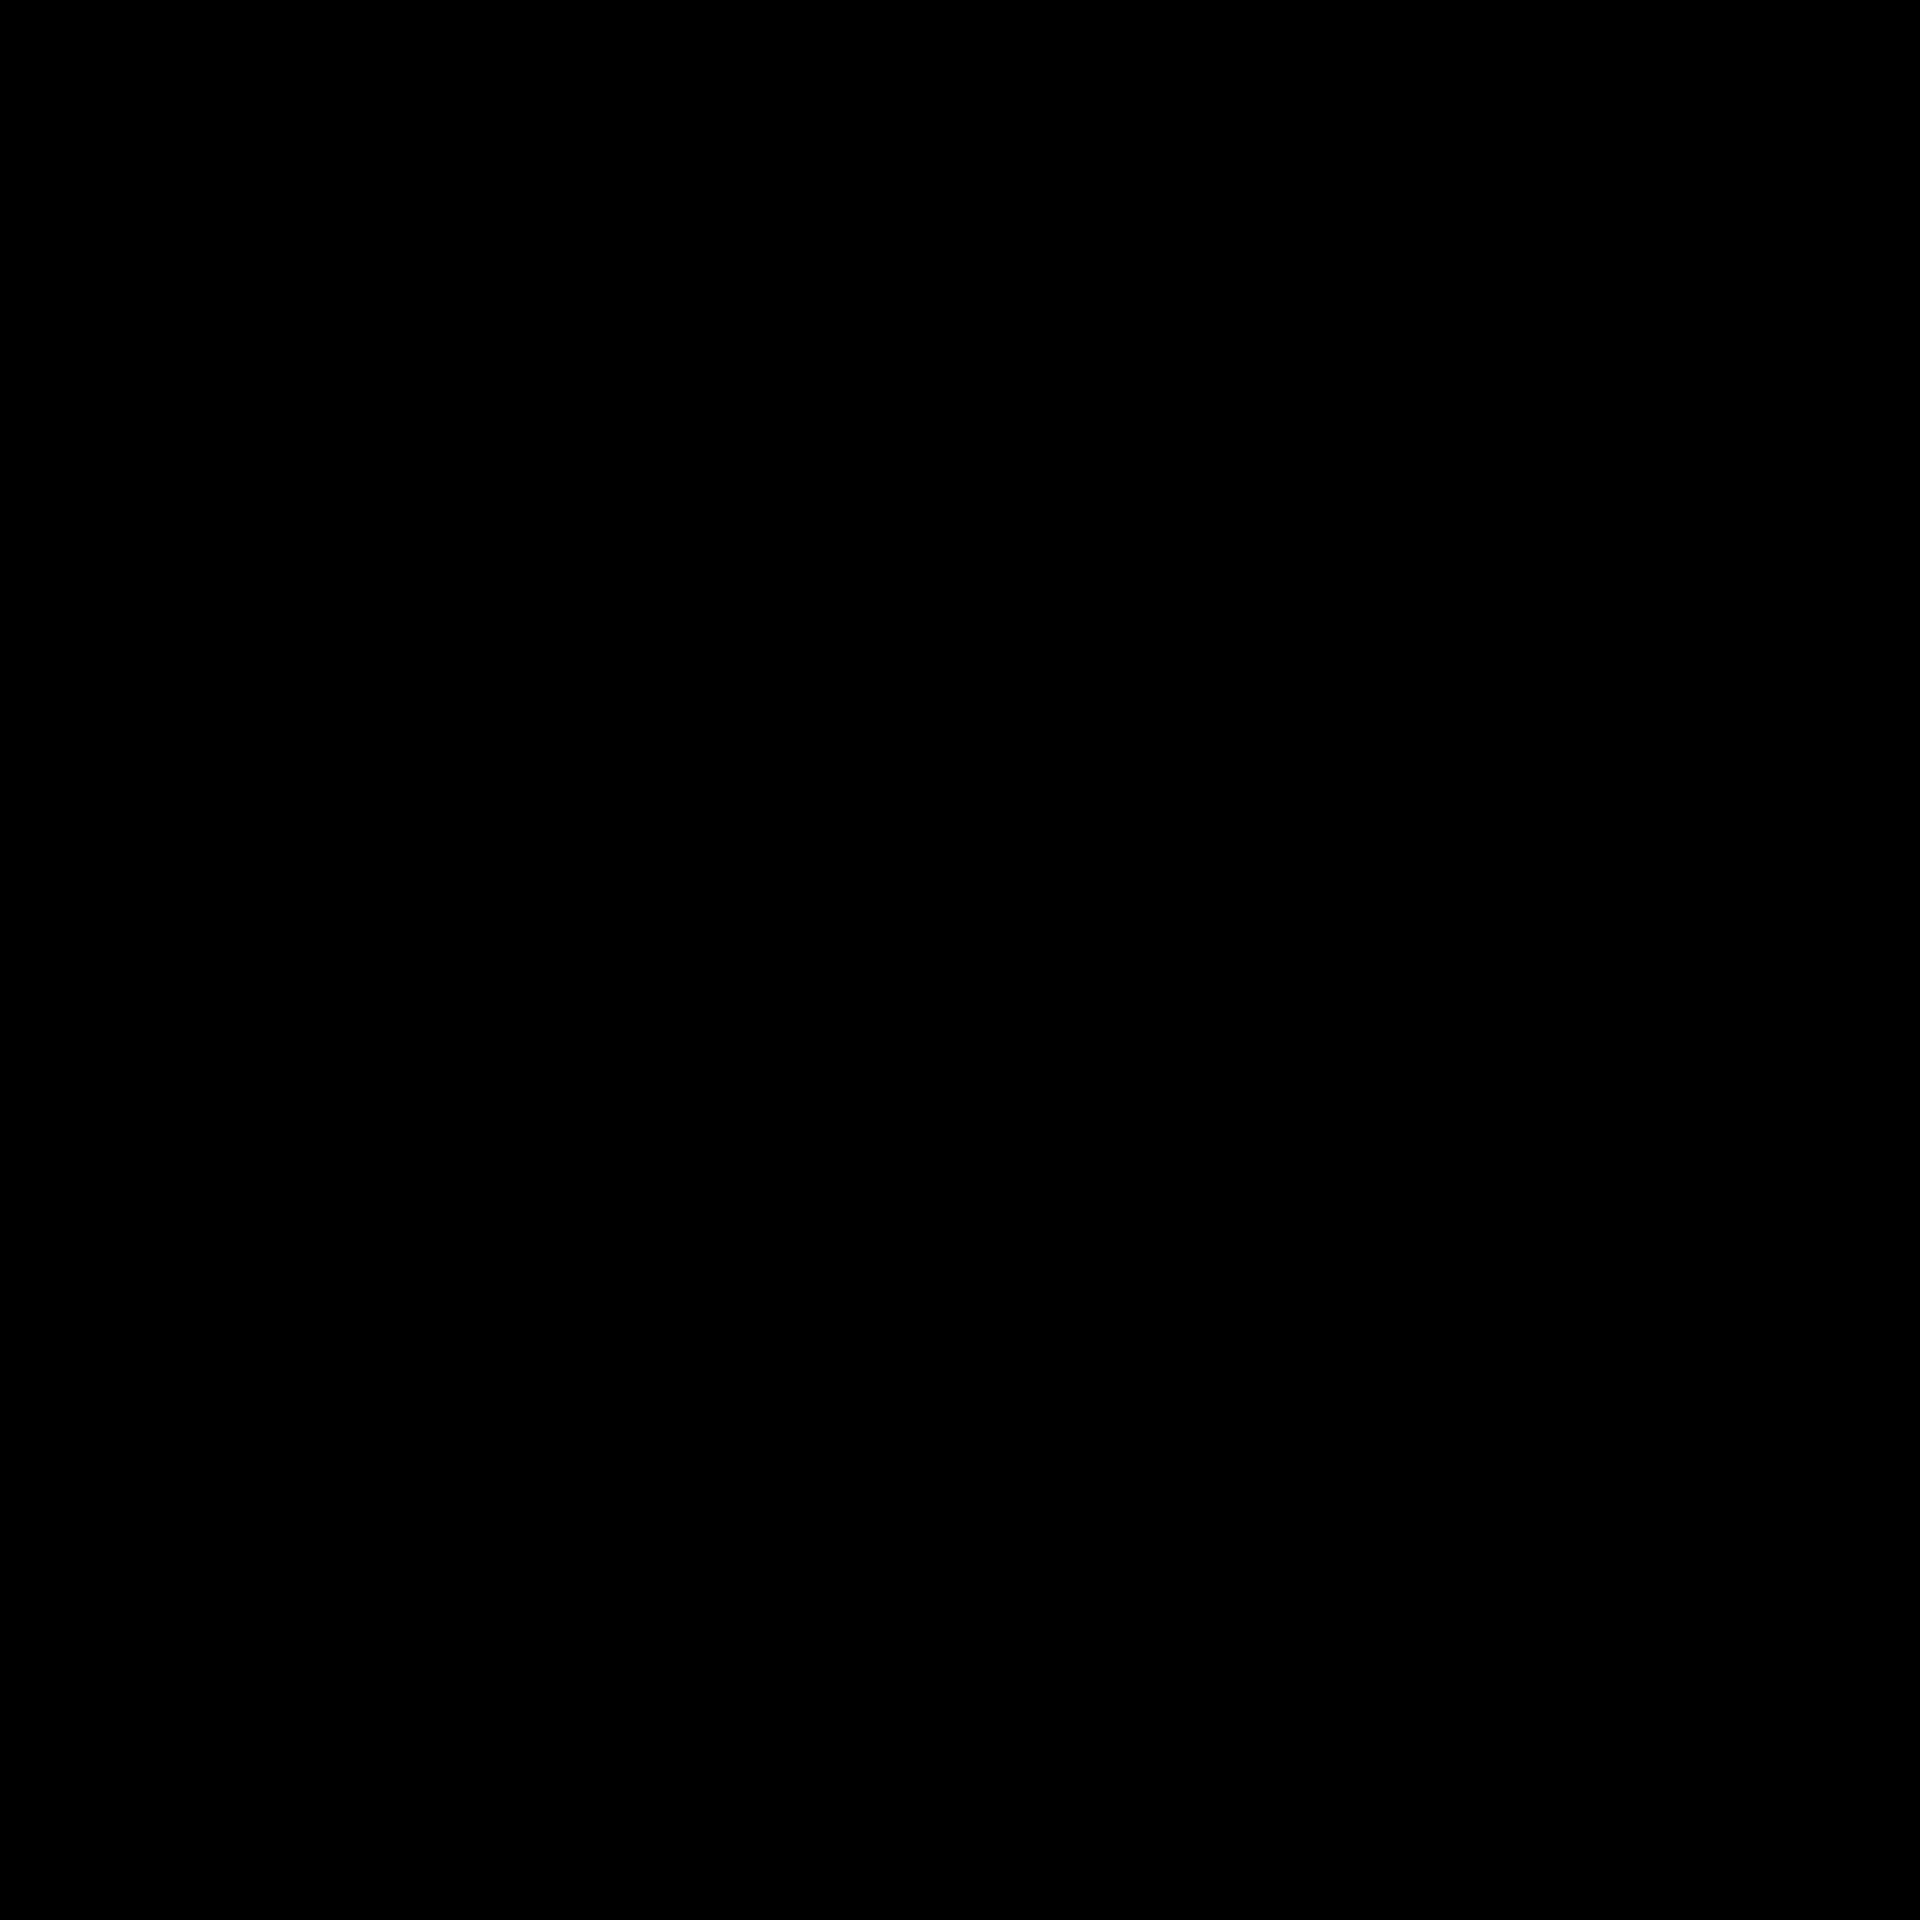 icon-1332794_1920